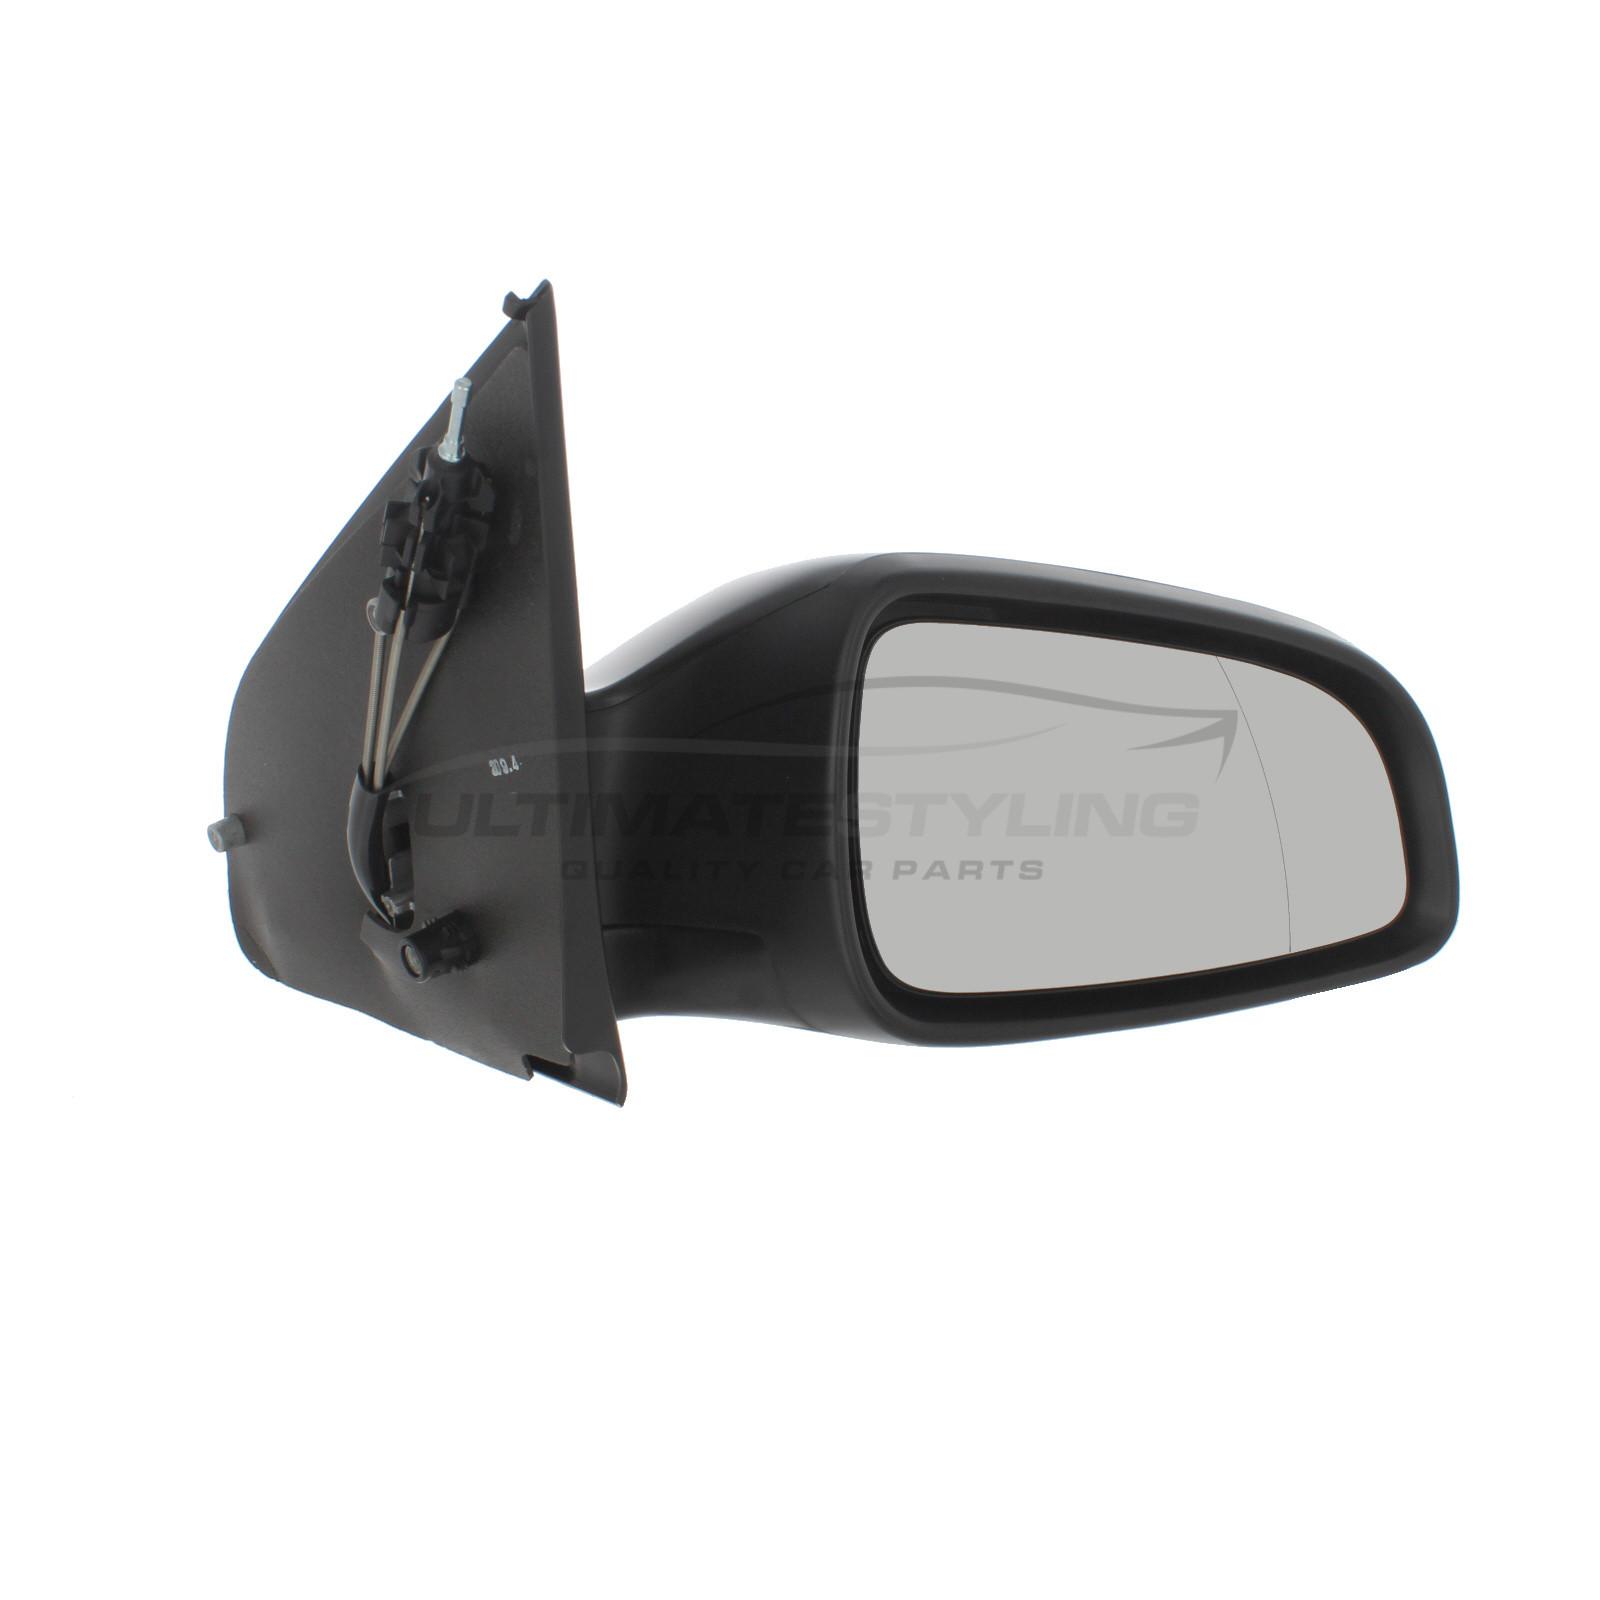 VAUXHALL ASTRA H VAN 2007 Door Mirror Cable RH Right Drivers